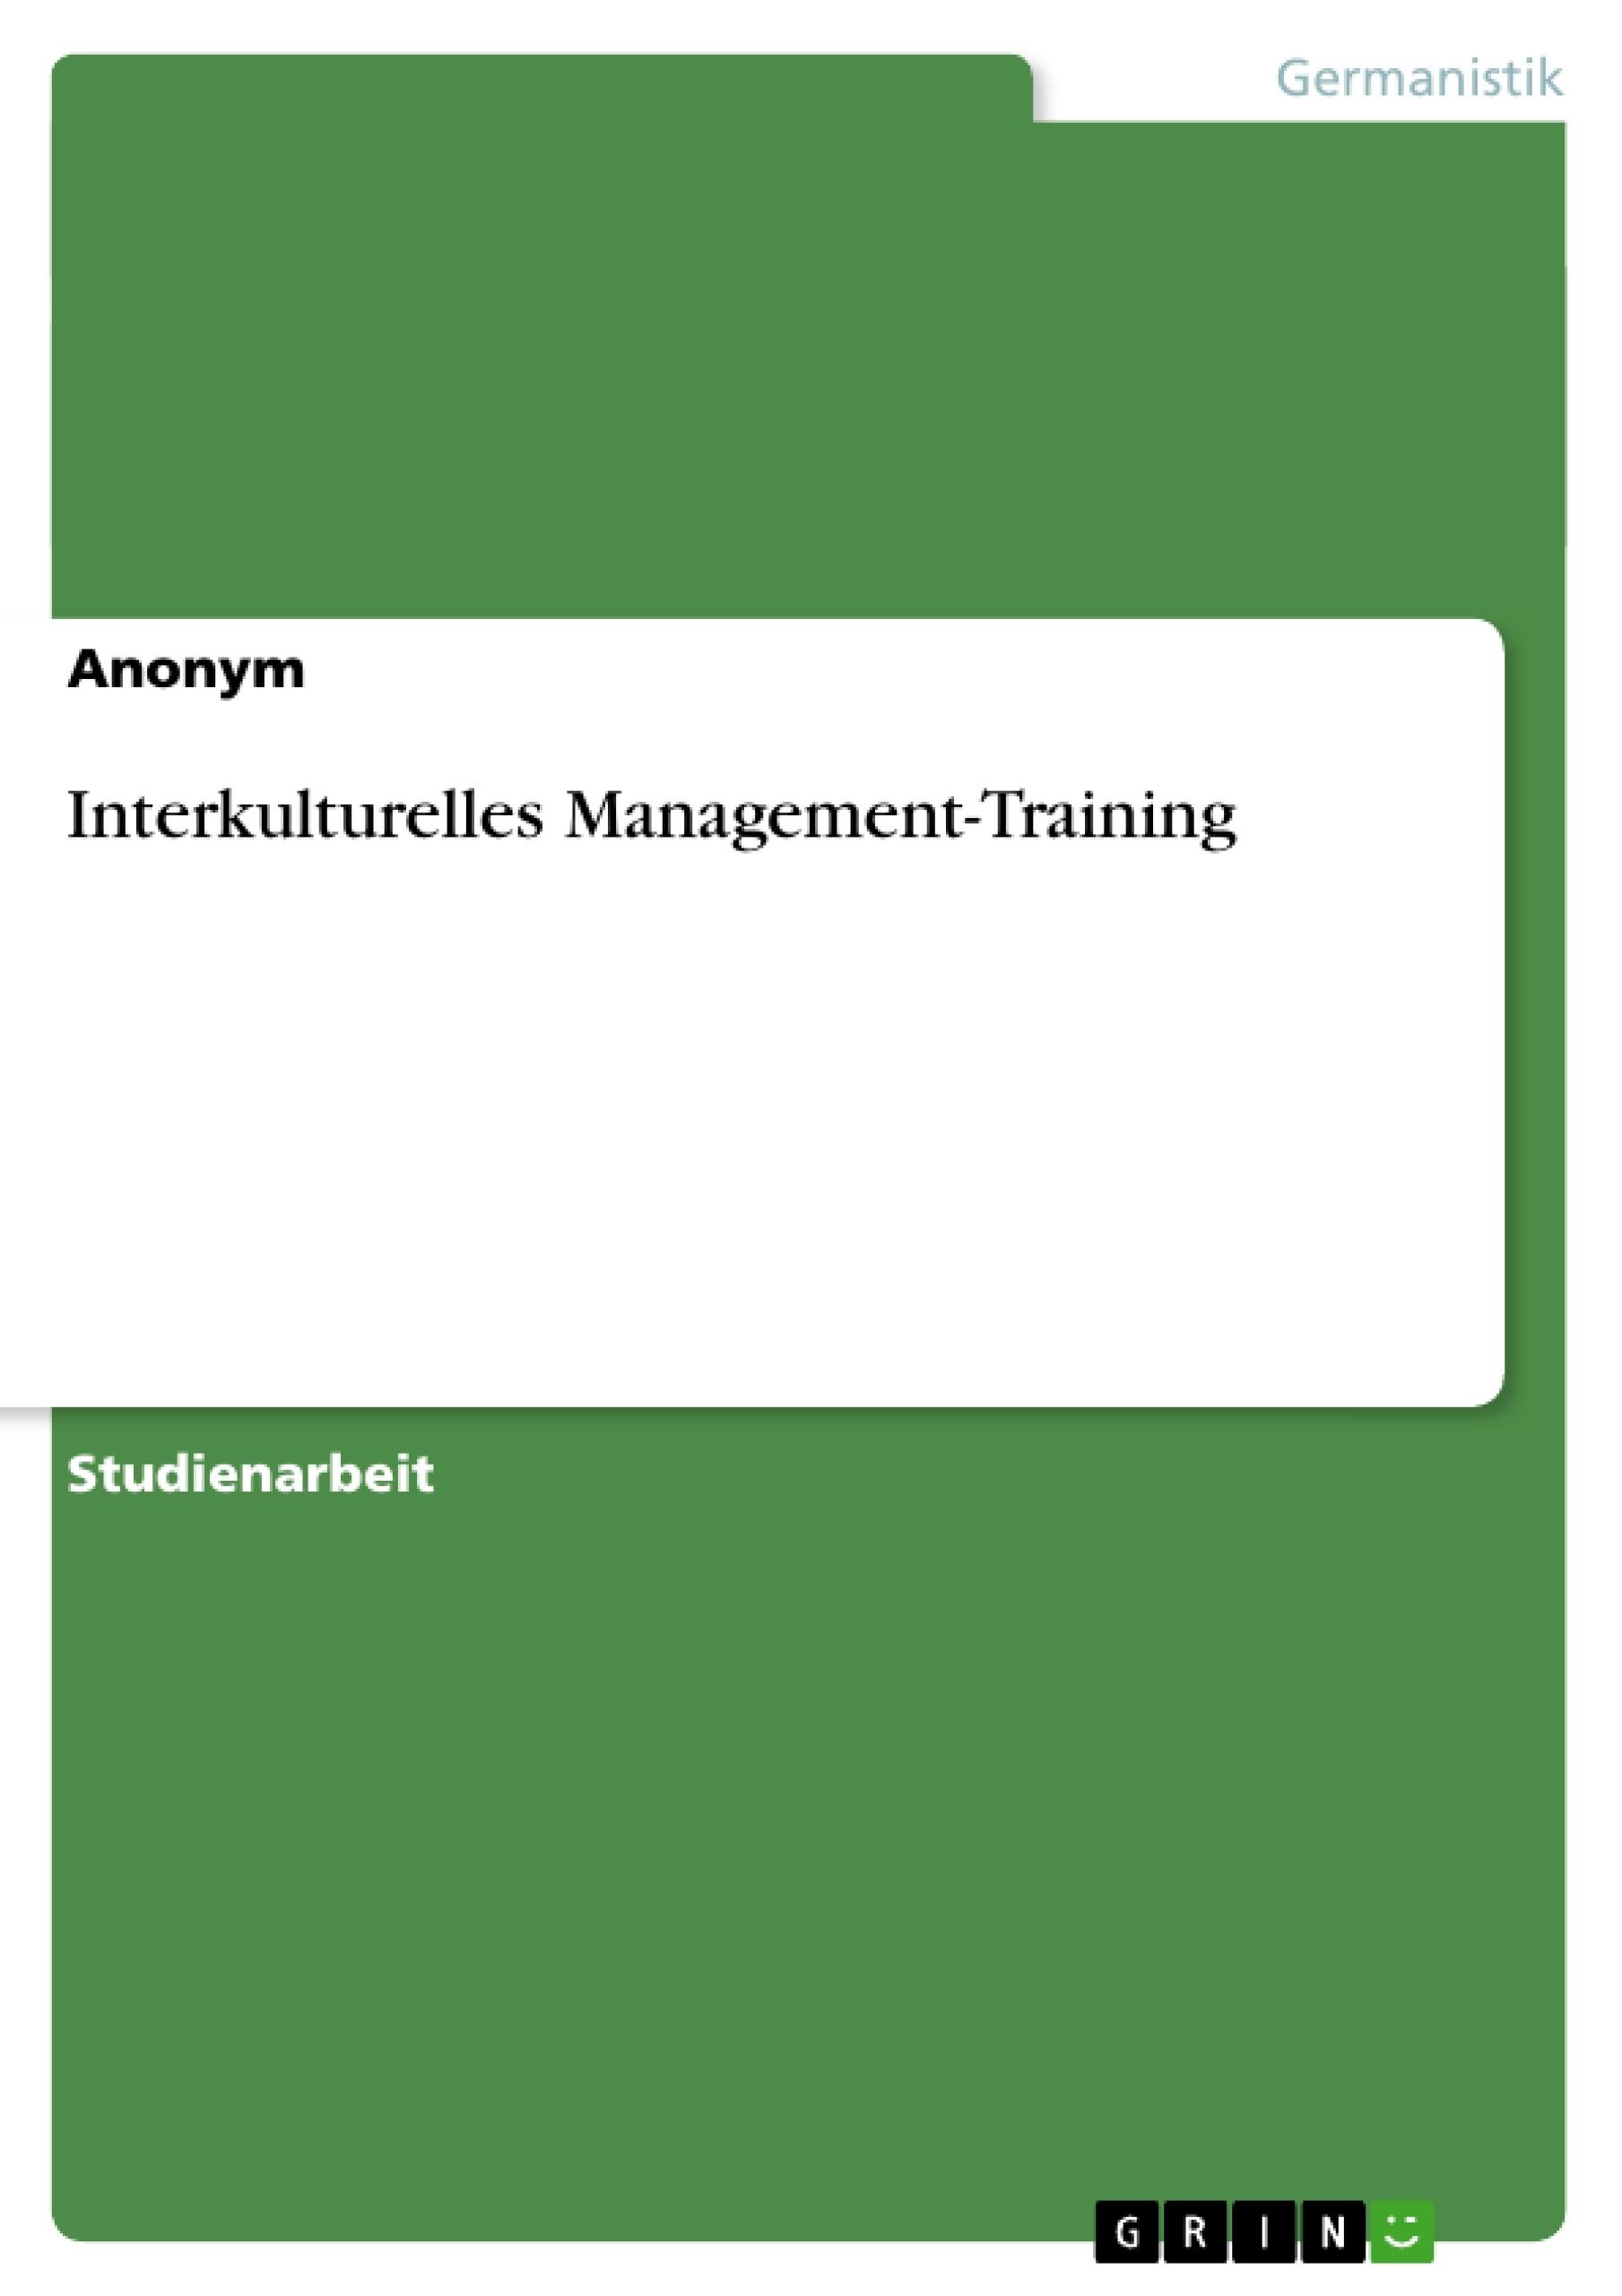 Titel: Interkulturelles Management-Training